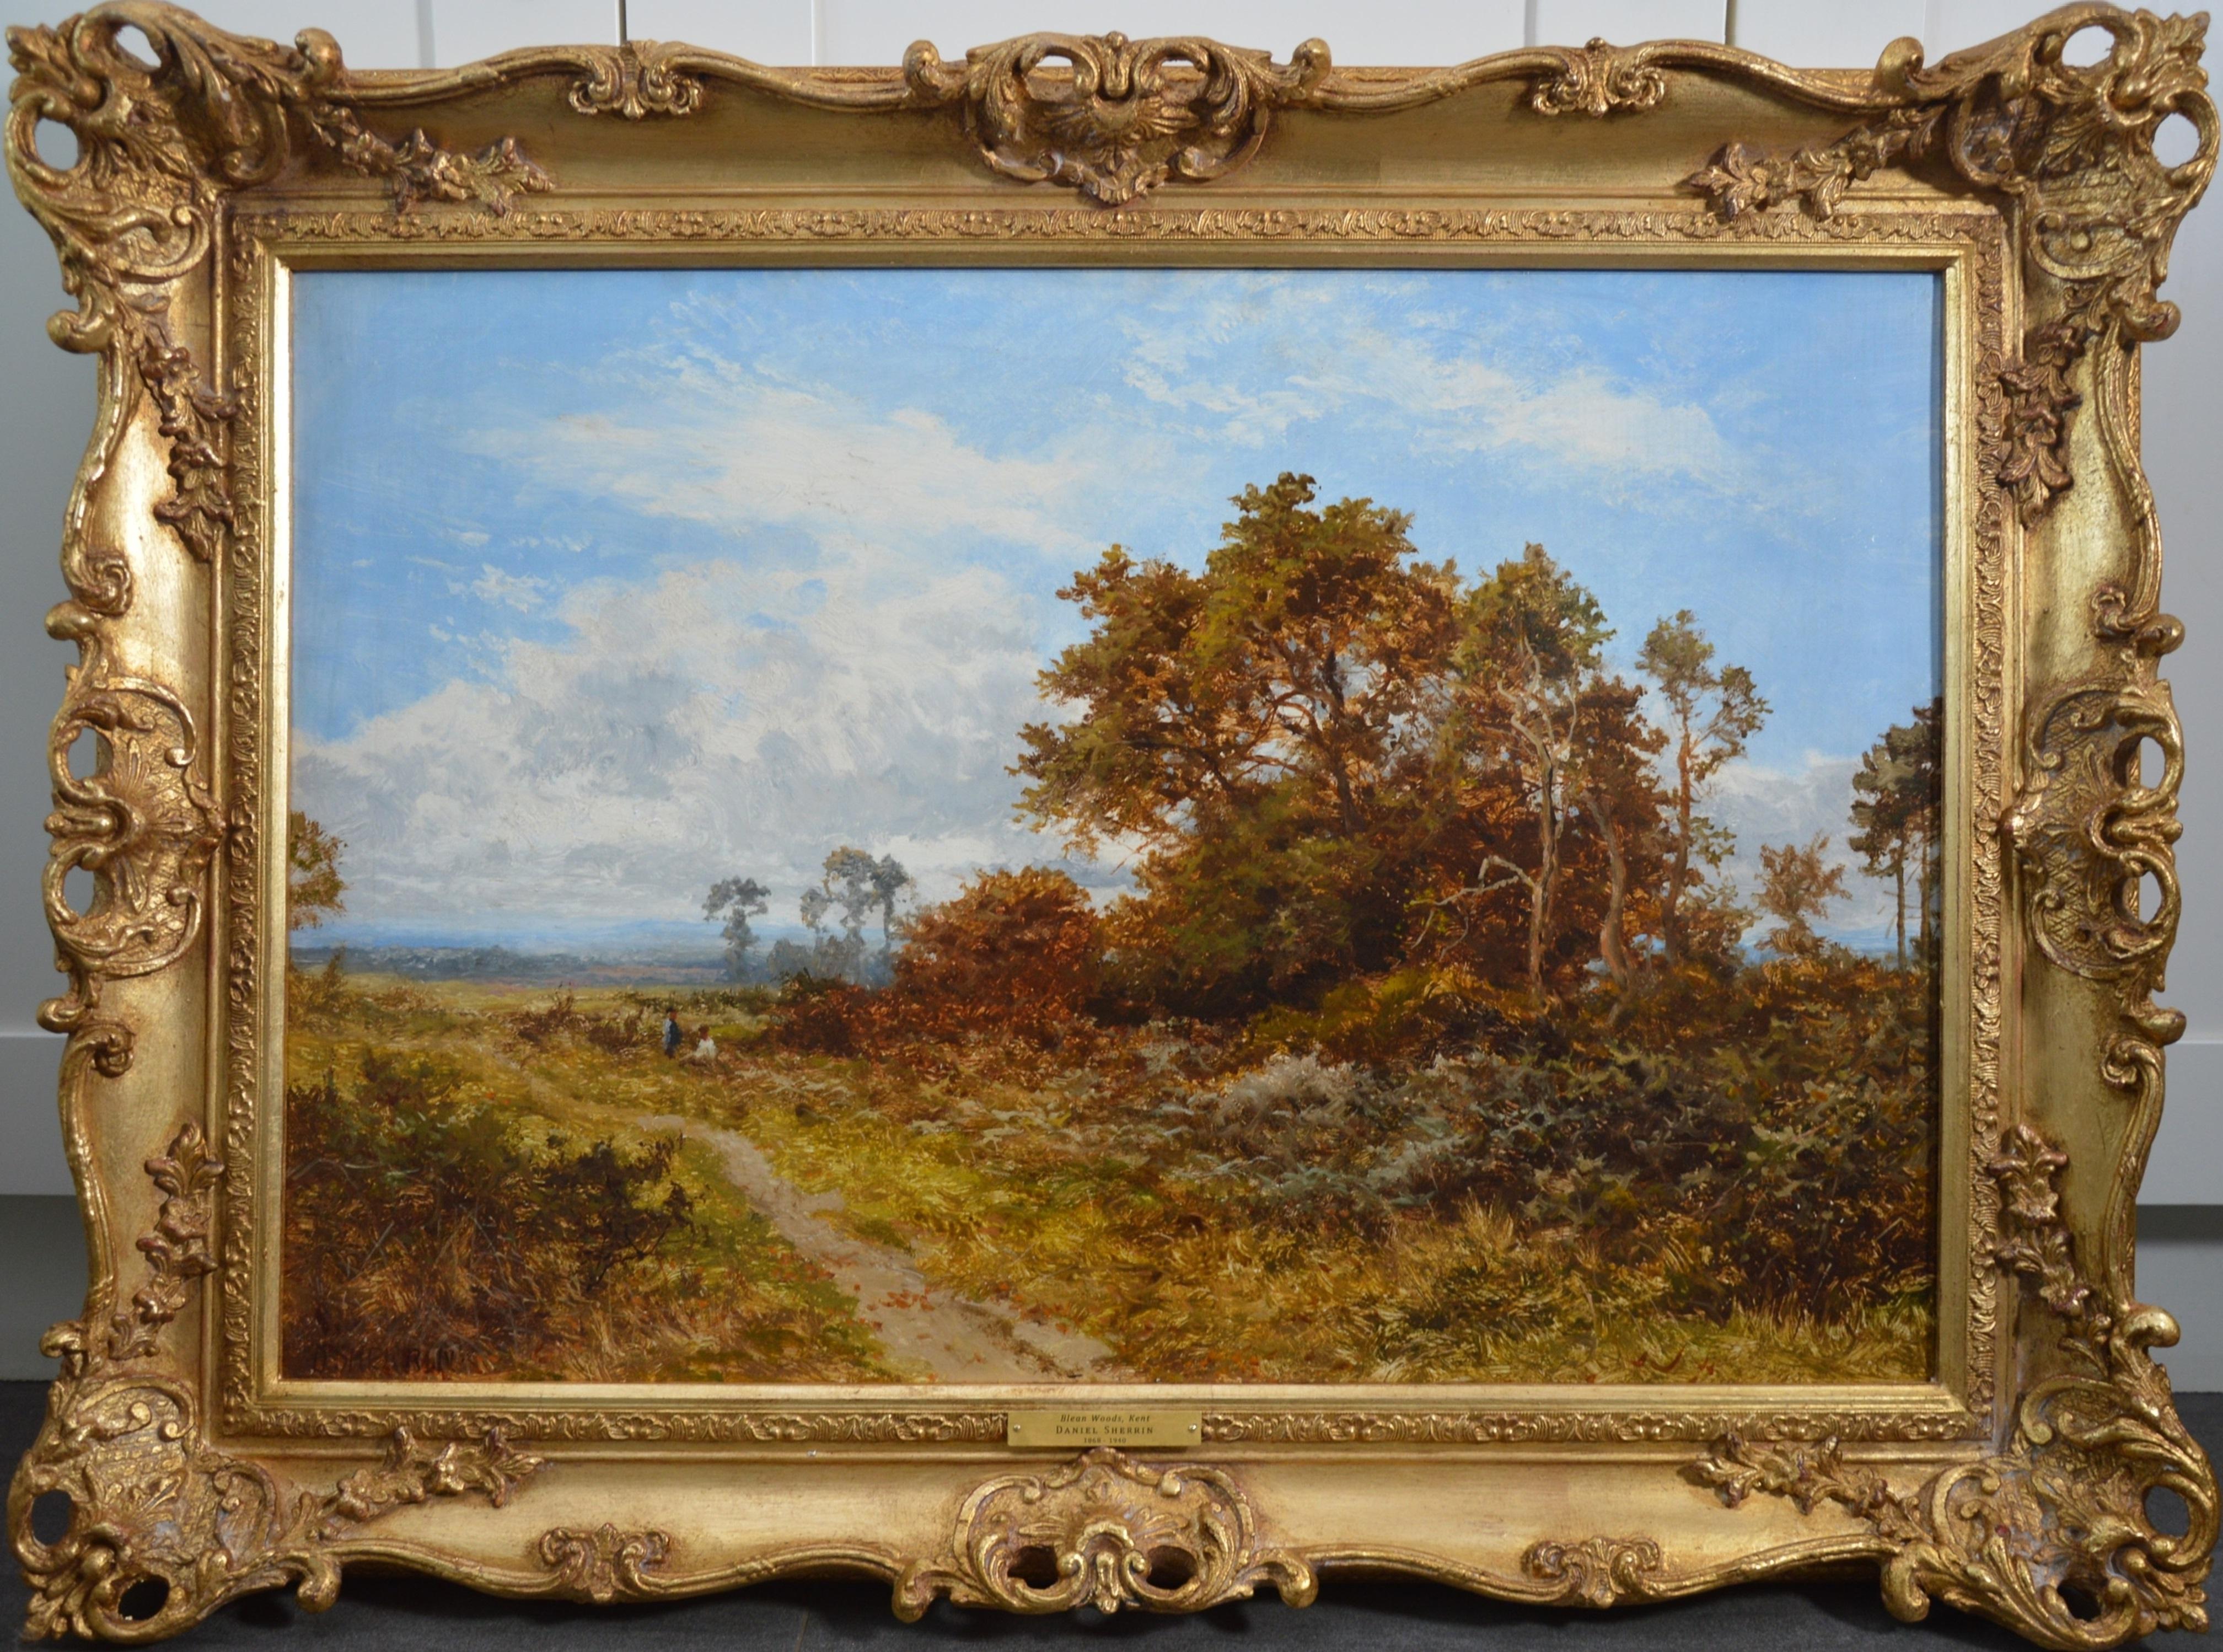 Blean Woods, Kent - 19th Century English Summer Landscape Oil Painting